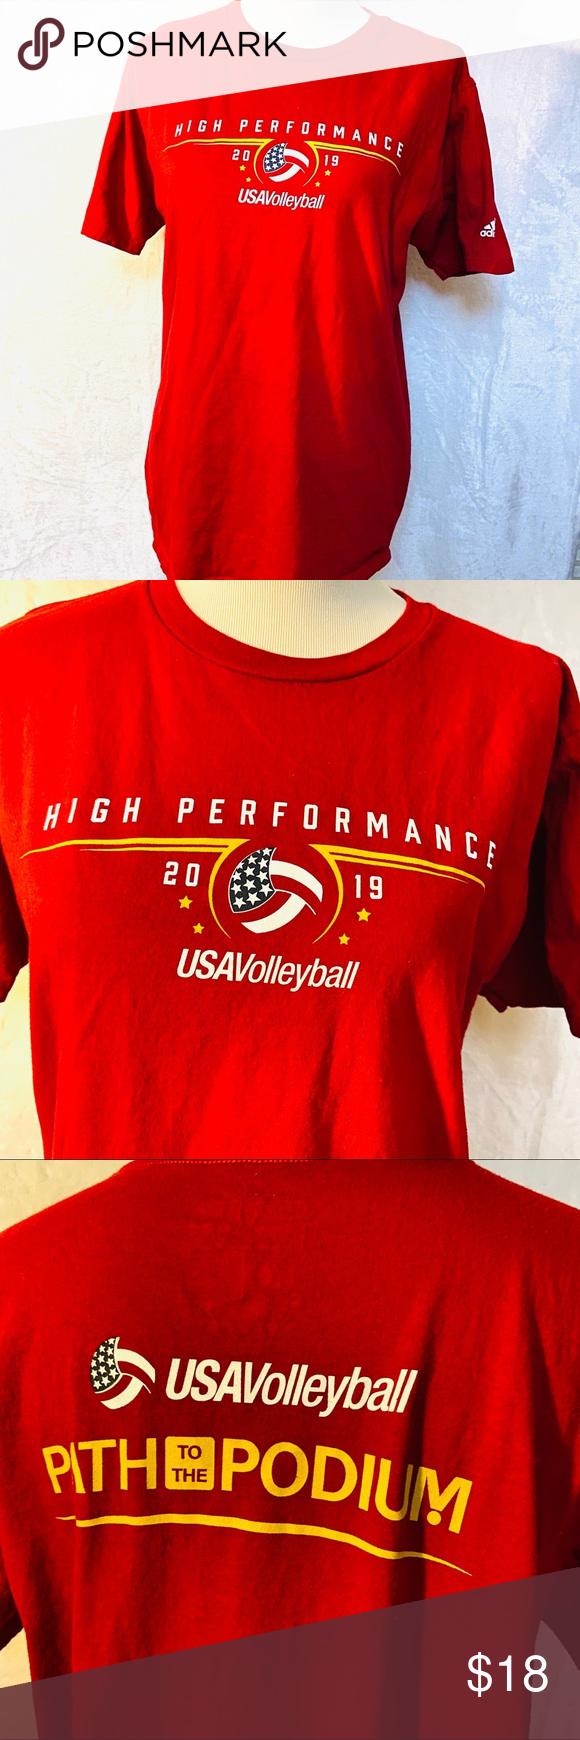 Adidas Usa Volleyball High Performance T Shirt Adidas Shirt Usa Volleyball Shirts